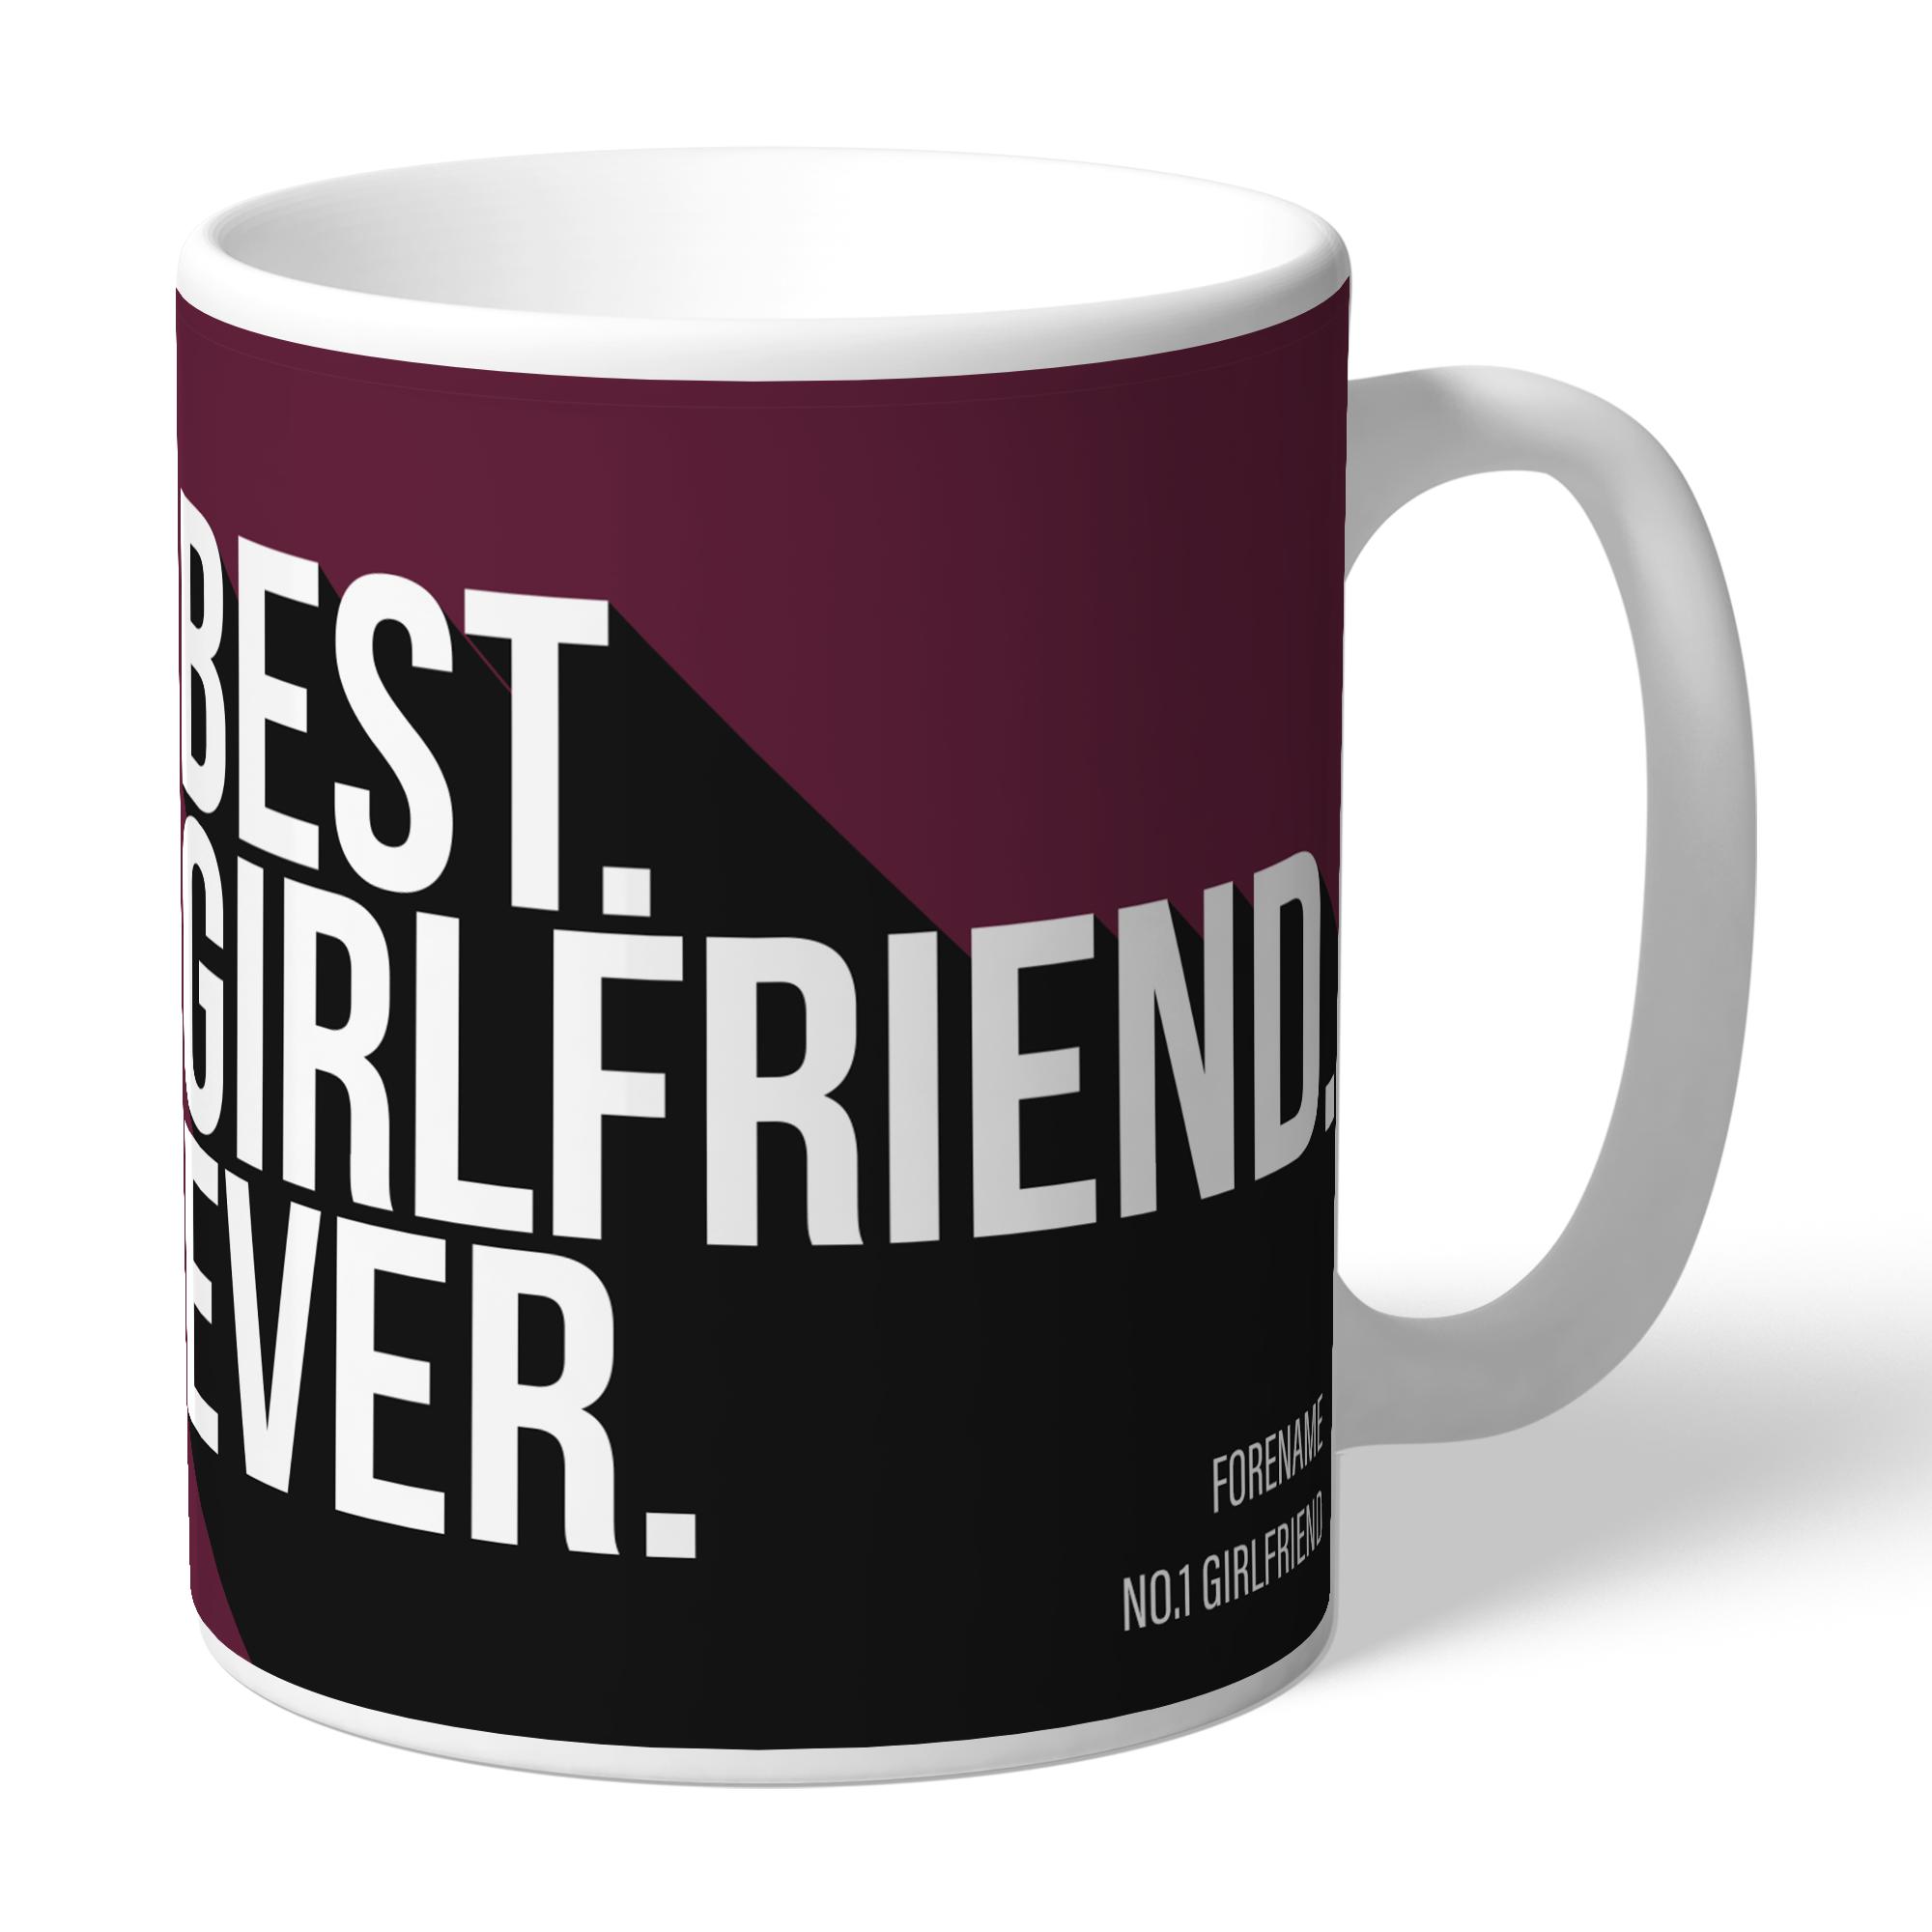 Burnley FC Best Girlfriend Ever Mug